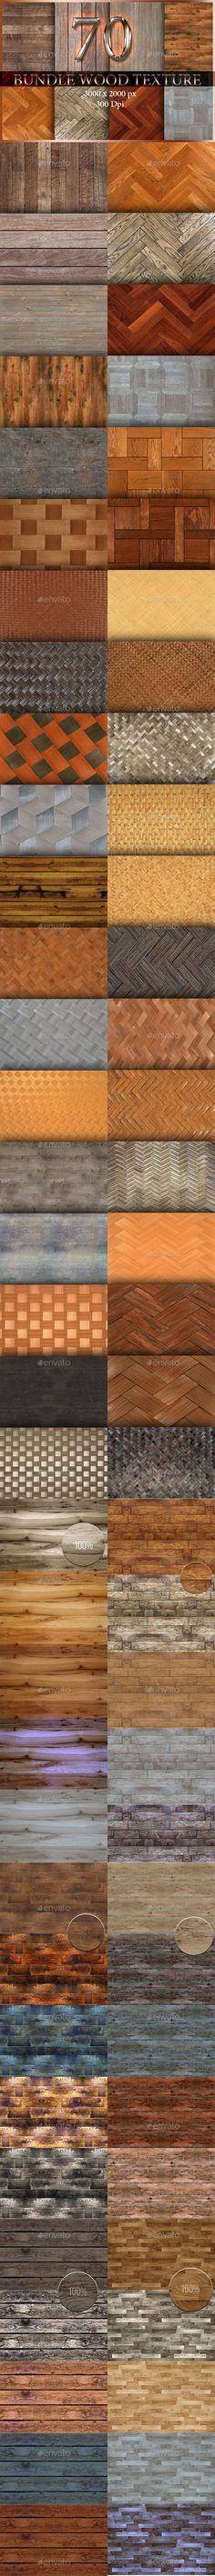 70 Bundle Wood Texture  v.1